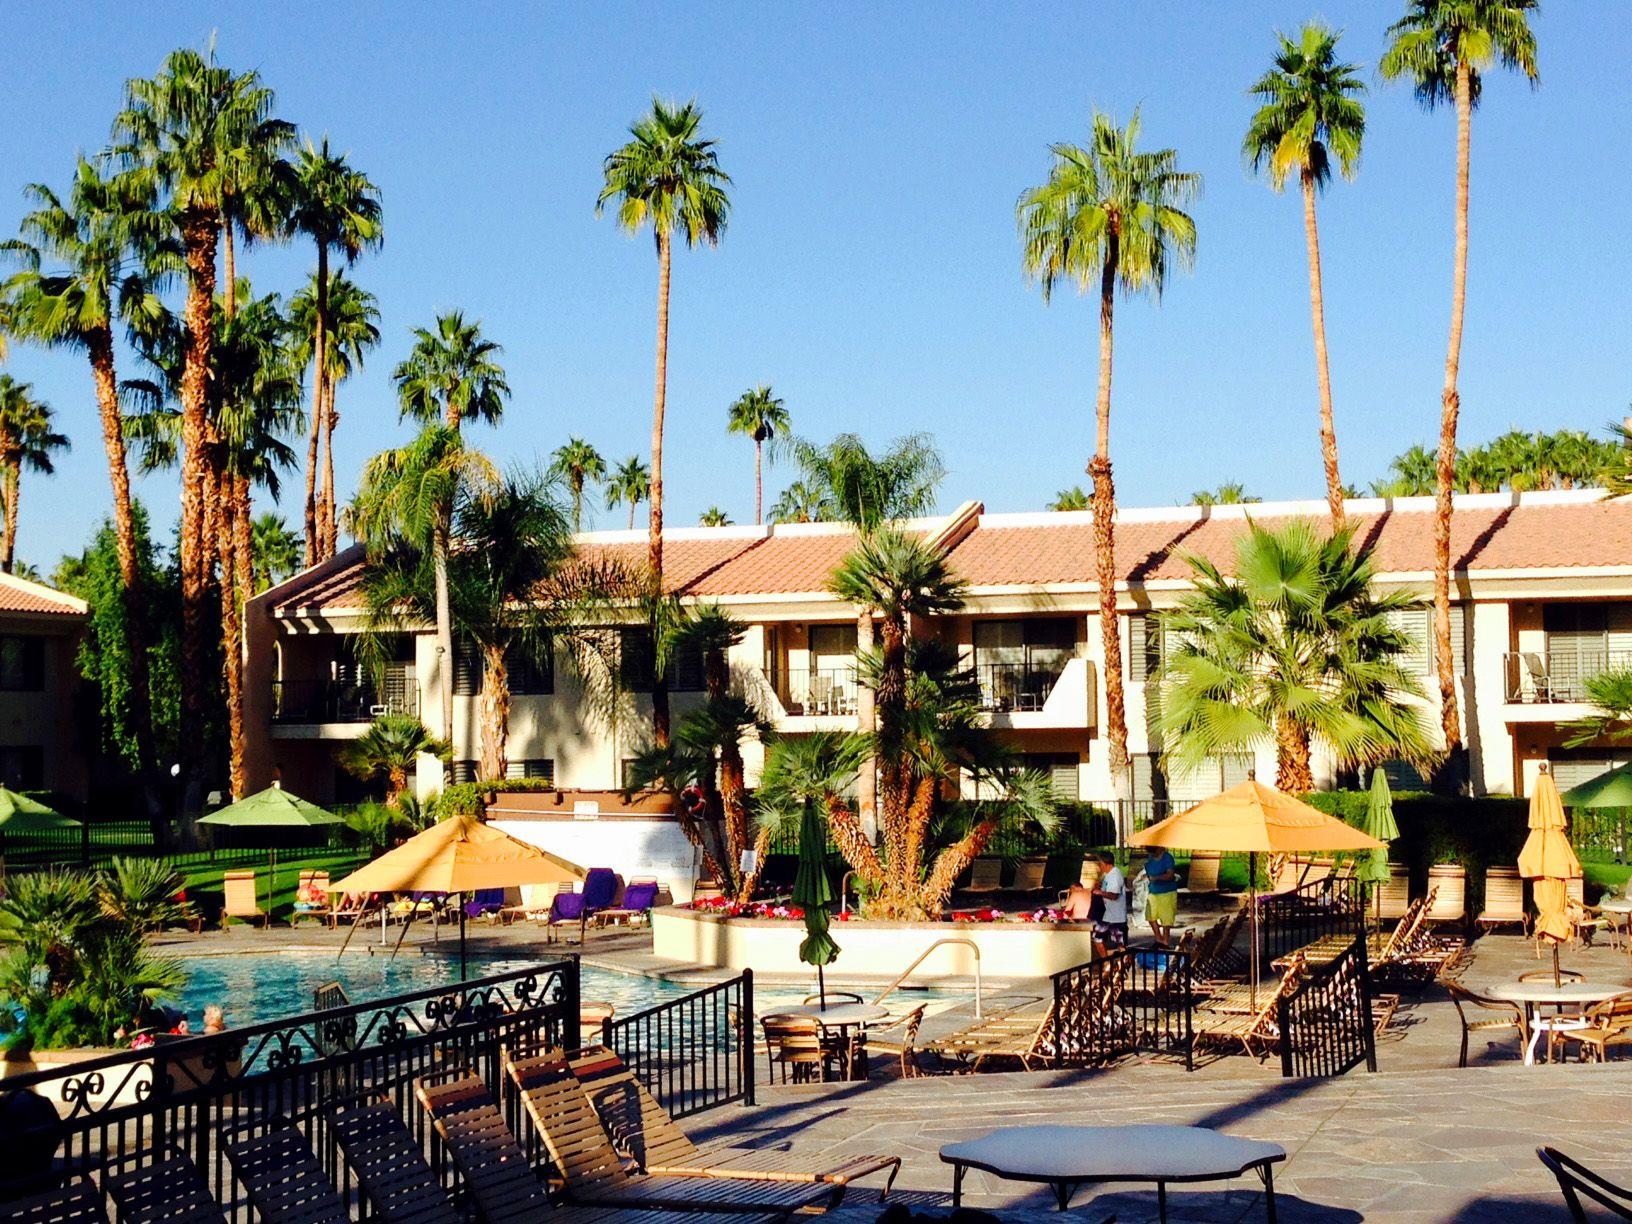 Our beautiful swimming pool here at Welk Resort Palm Springs ...